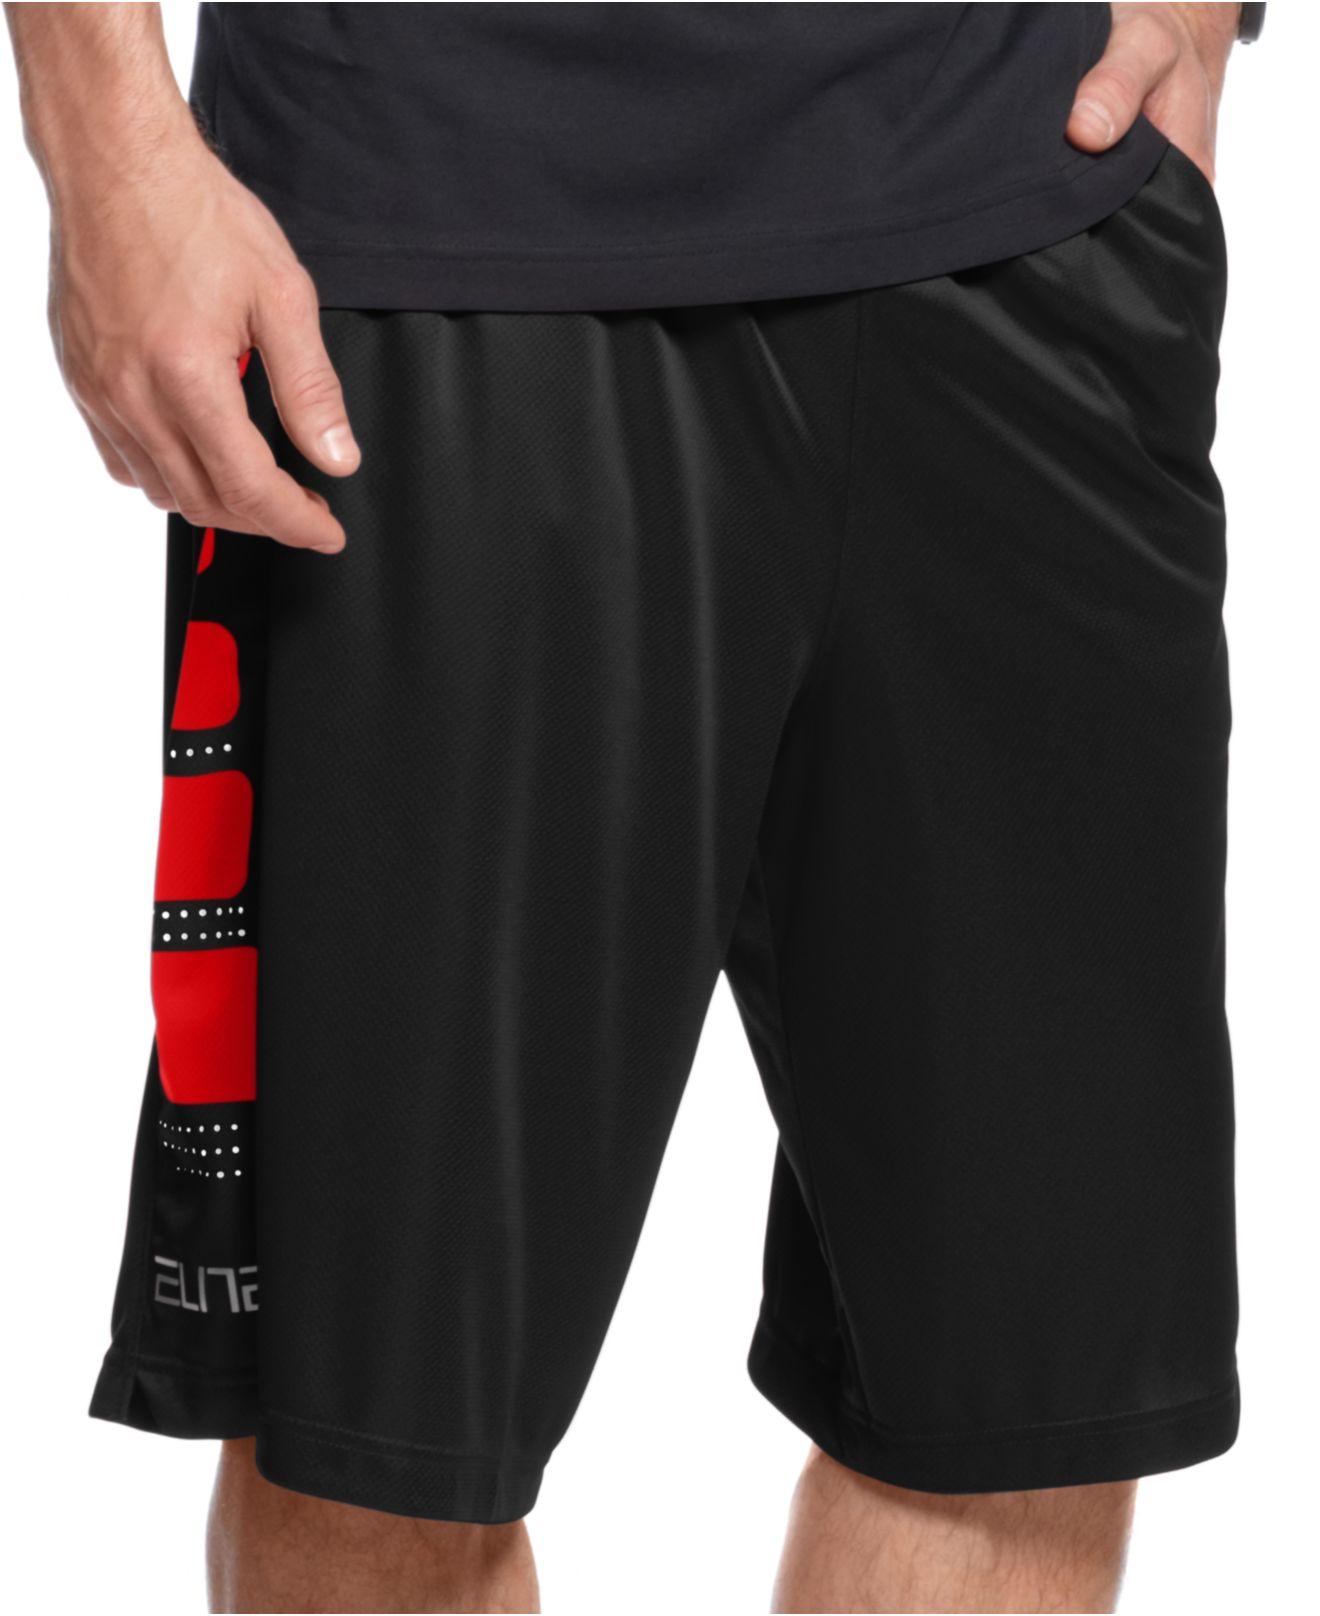 Fashion week Basketball red Black shorts for girls